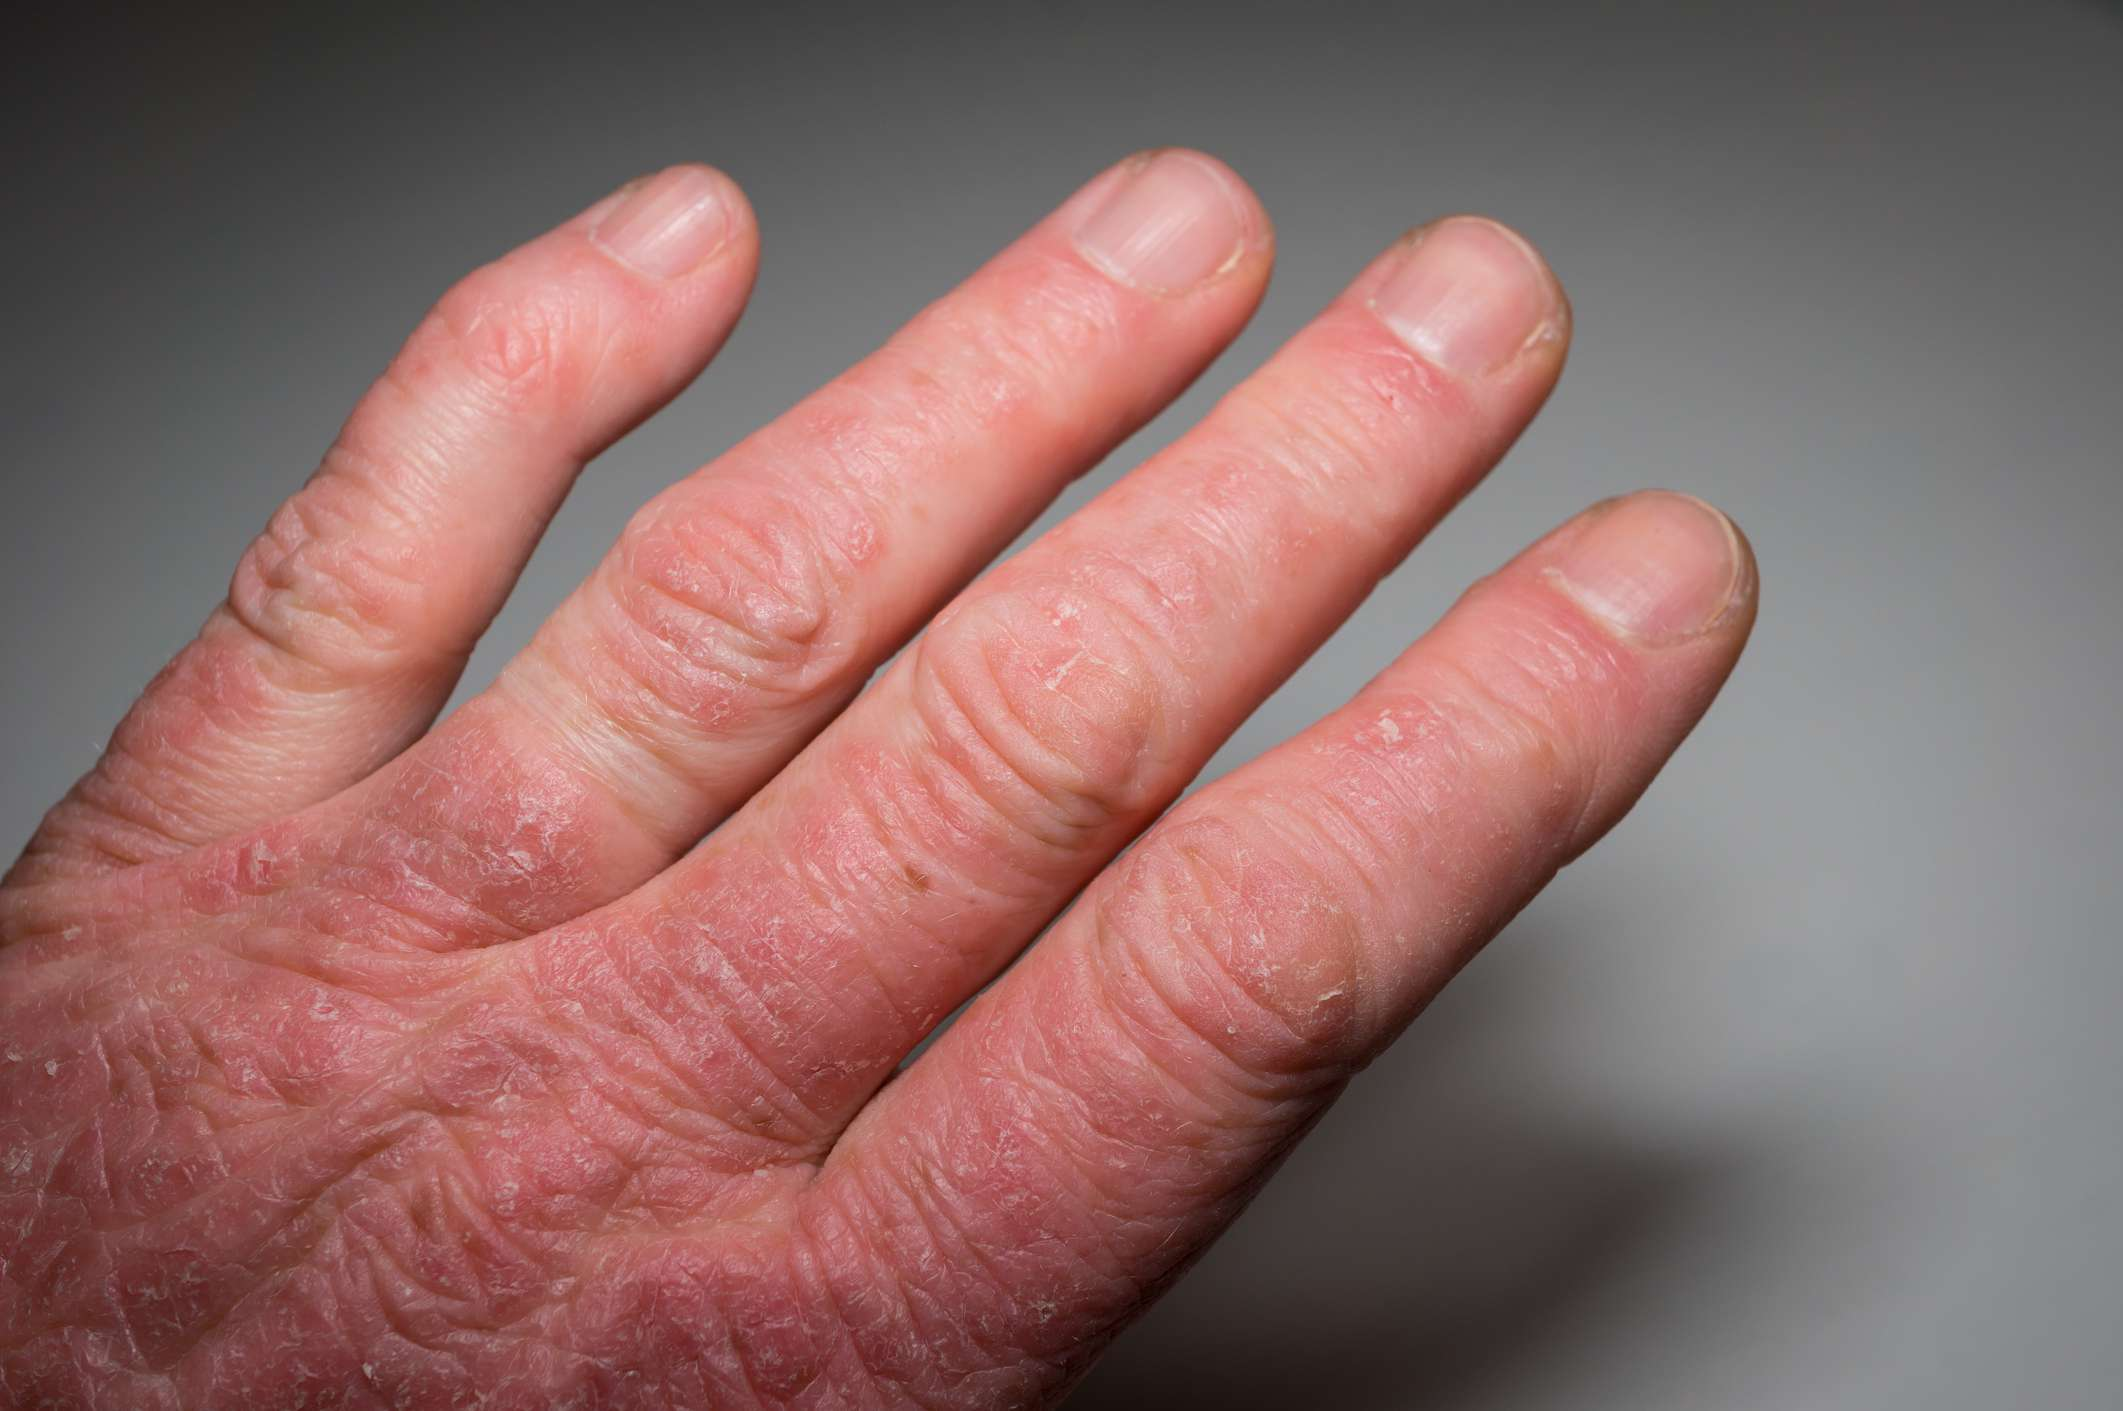 Psoriatic disease of the hand